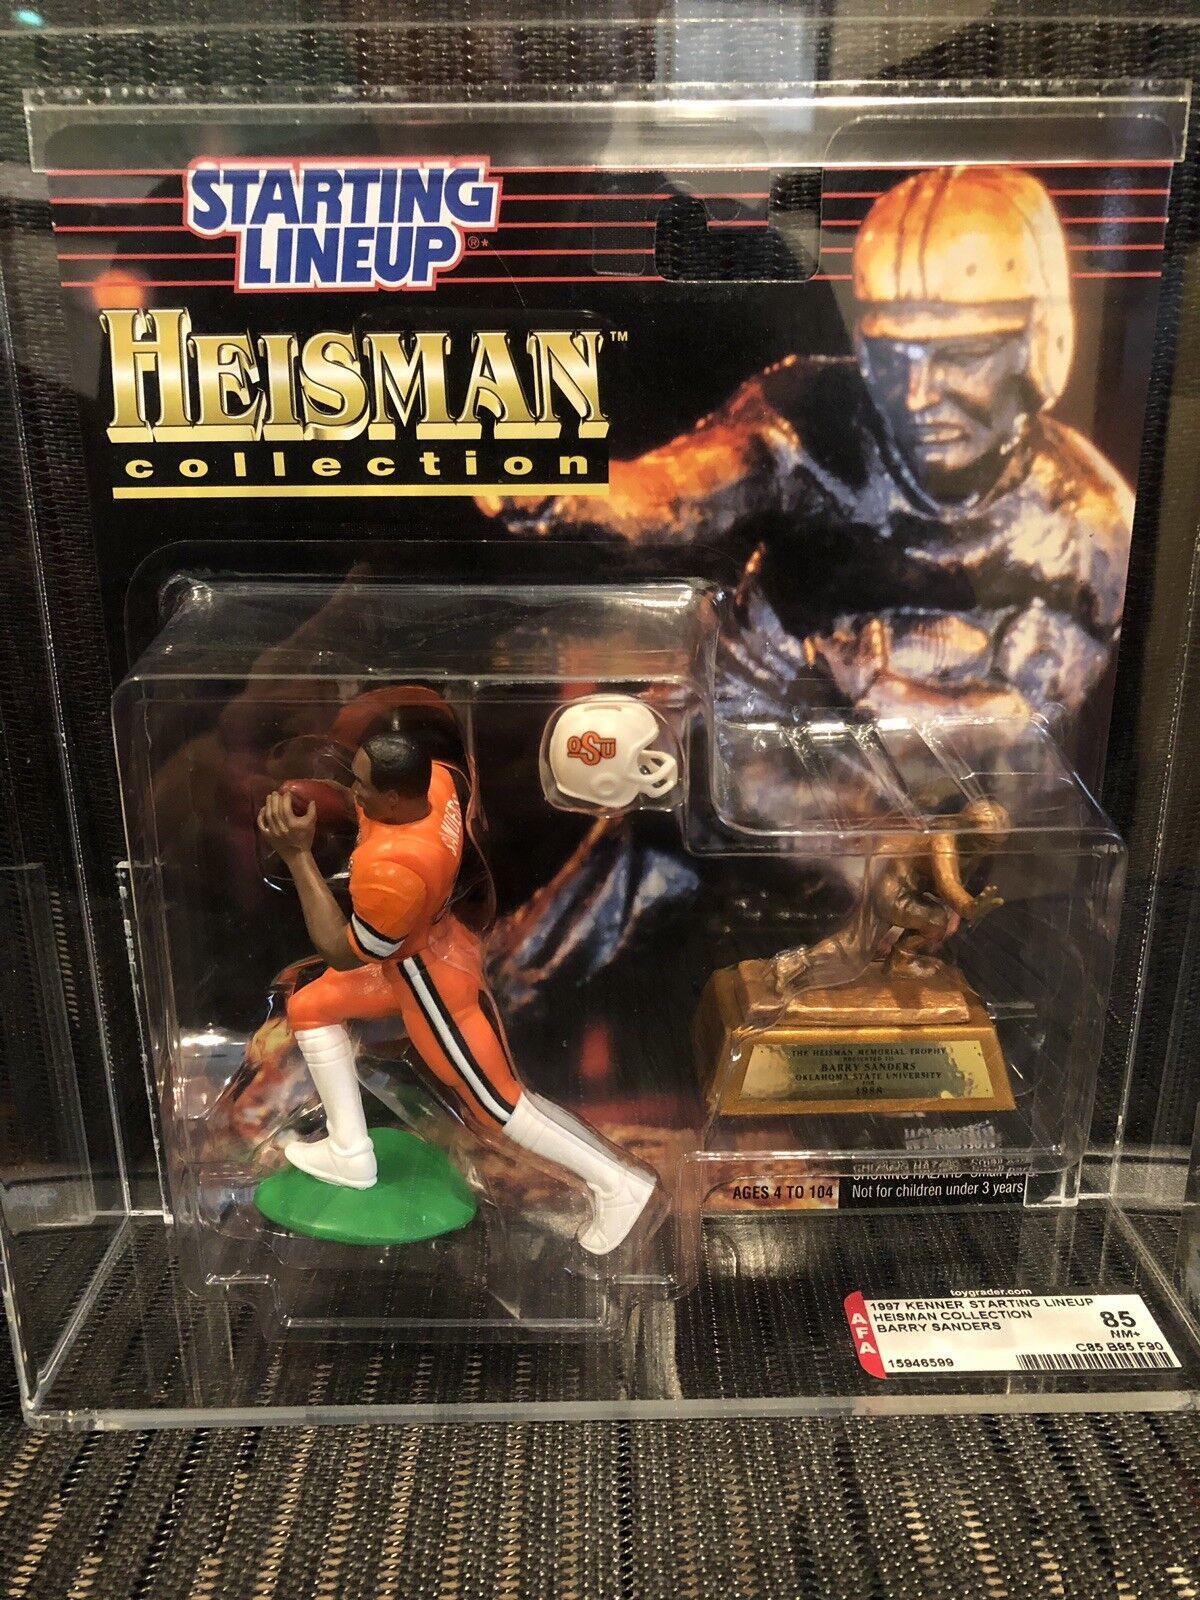 1997 Starting Lineup Barry Sanders Heisman Collection AFA 85 (85 85 90)